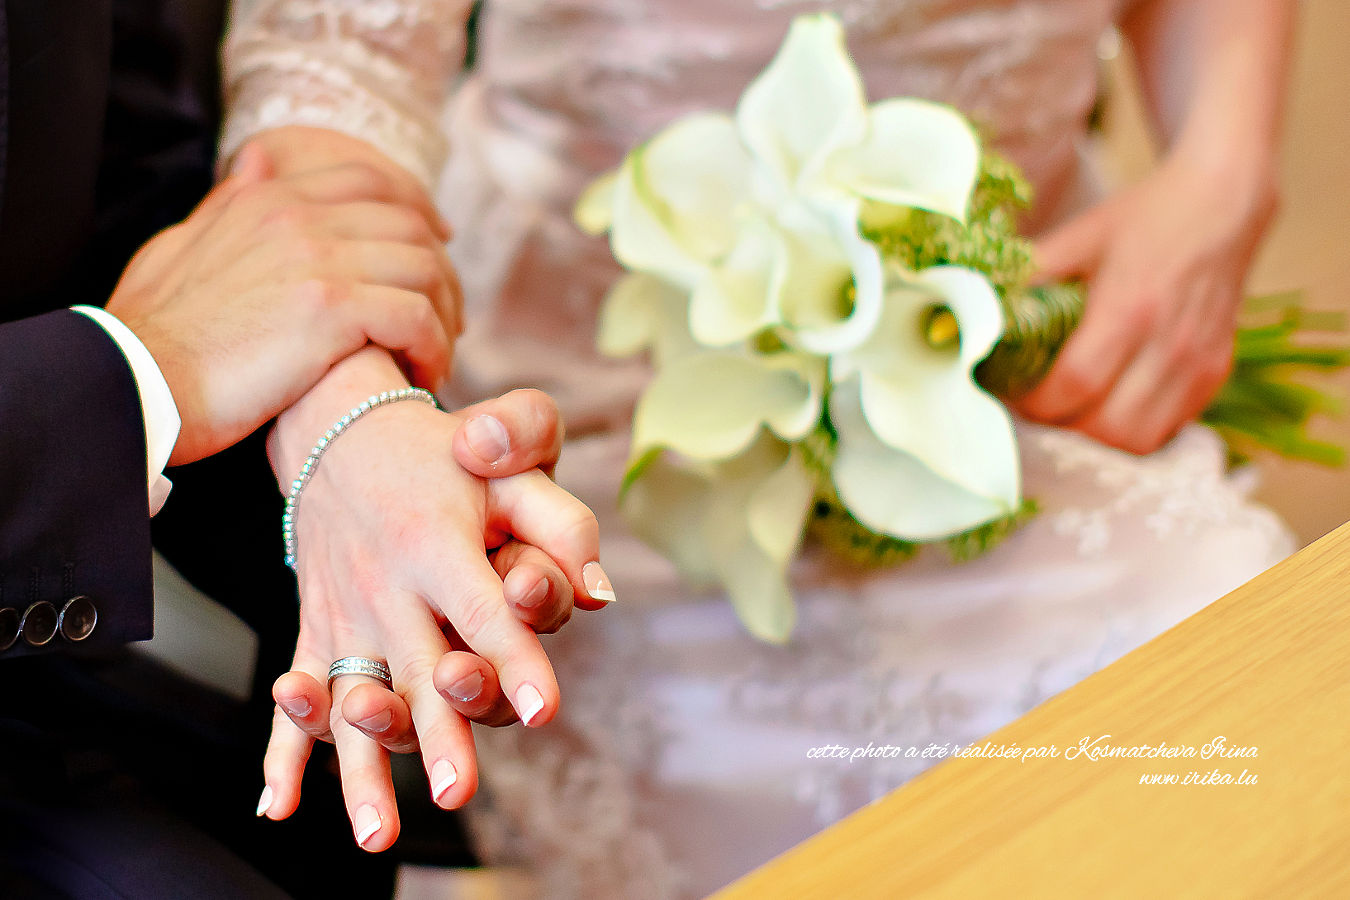 Calsa et quatre mains